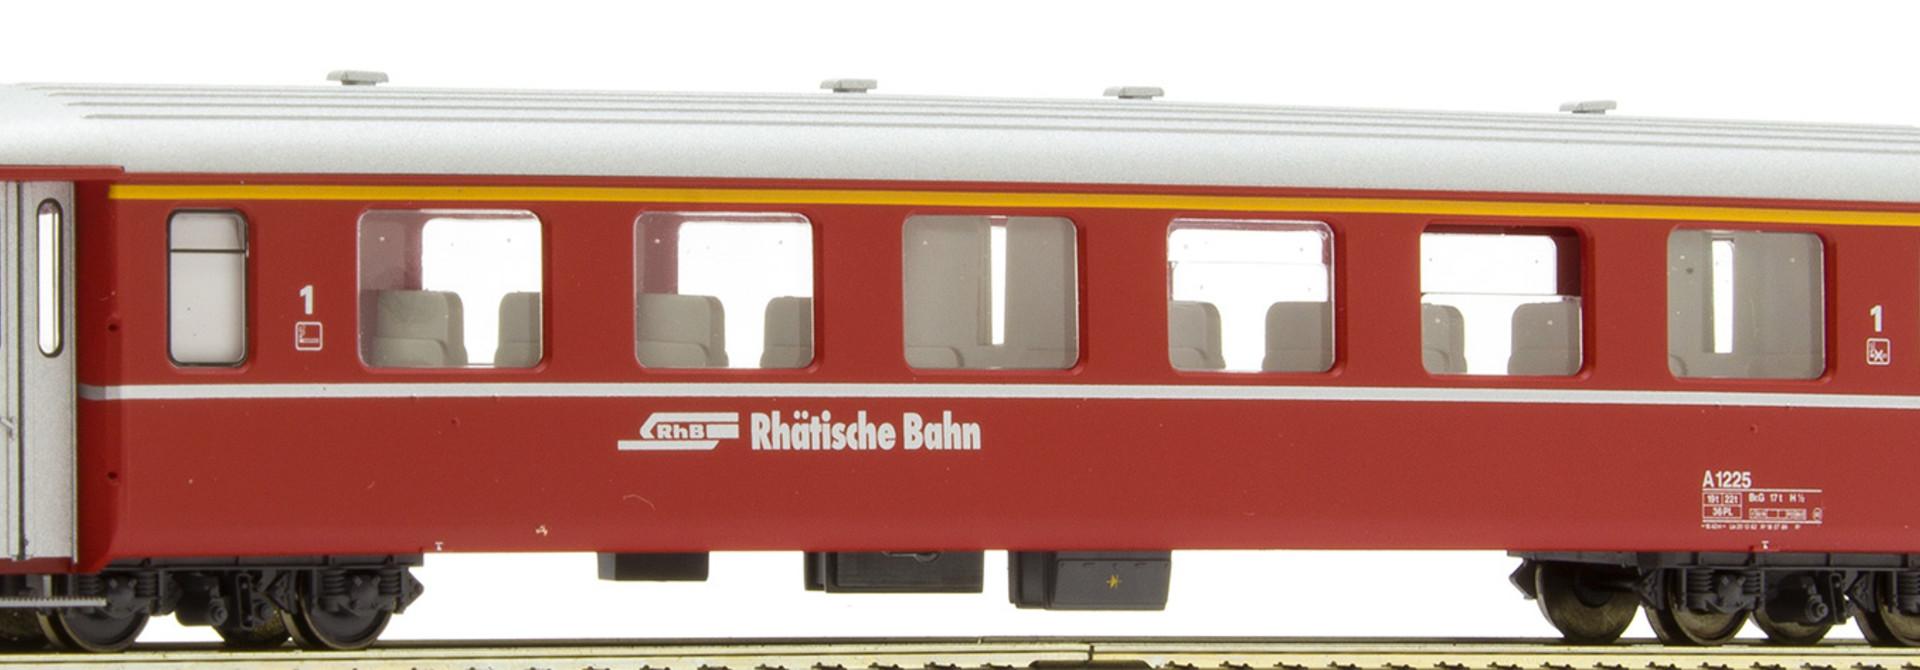 3252125 RhB A 1225 Einheitswagen I